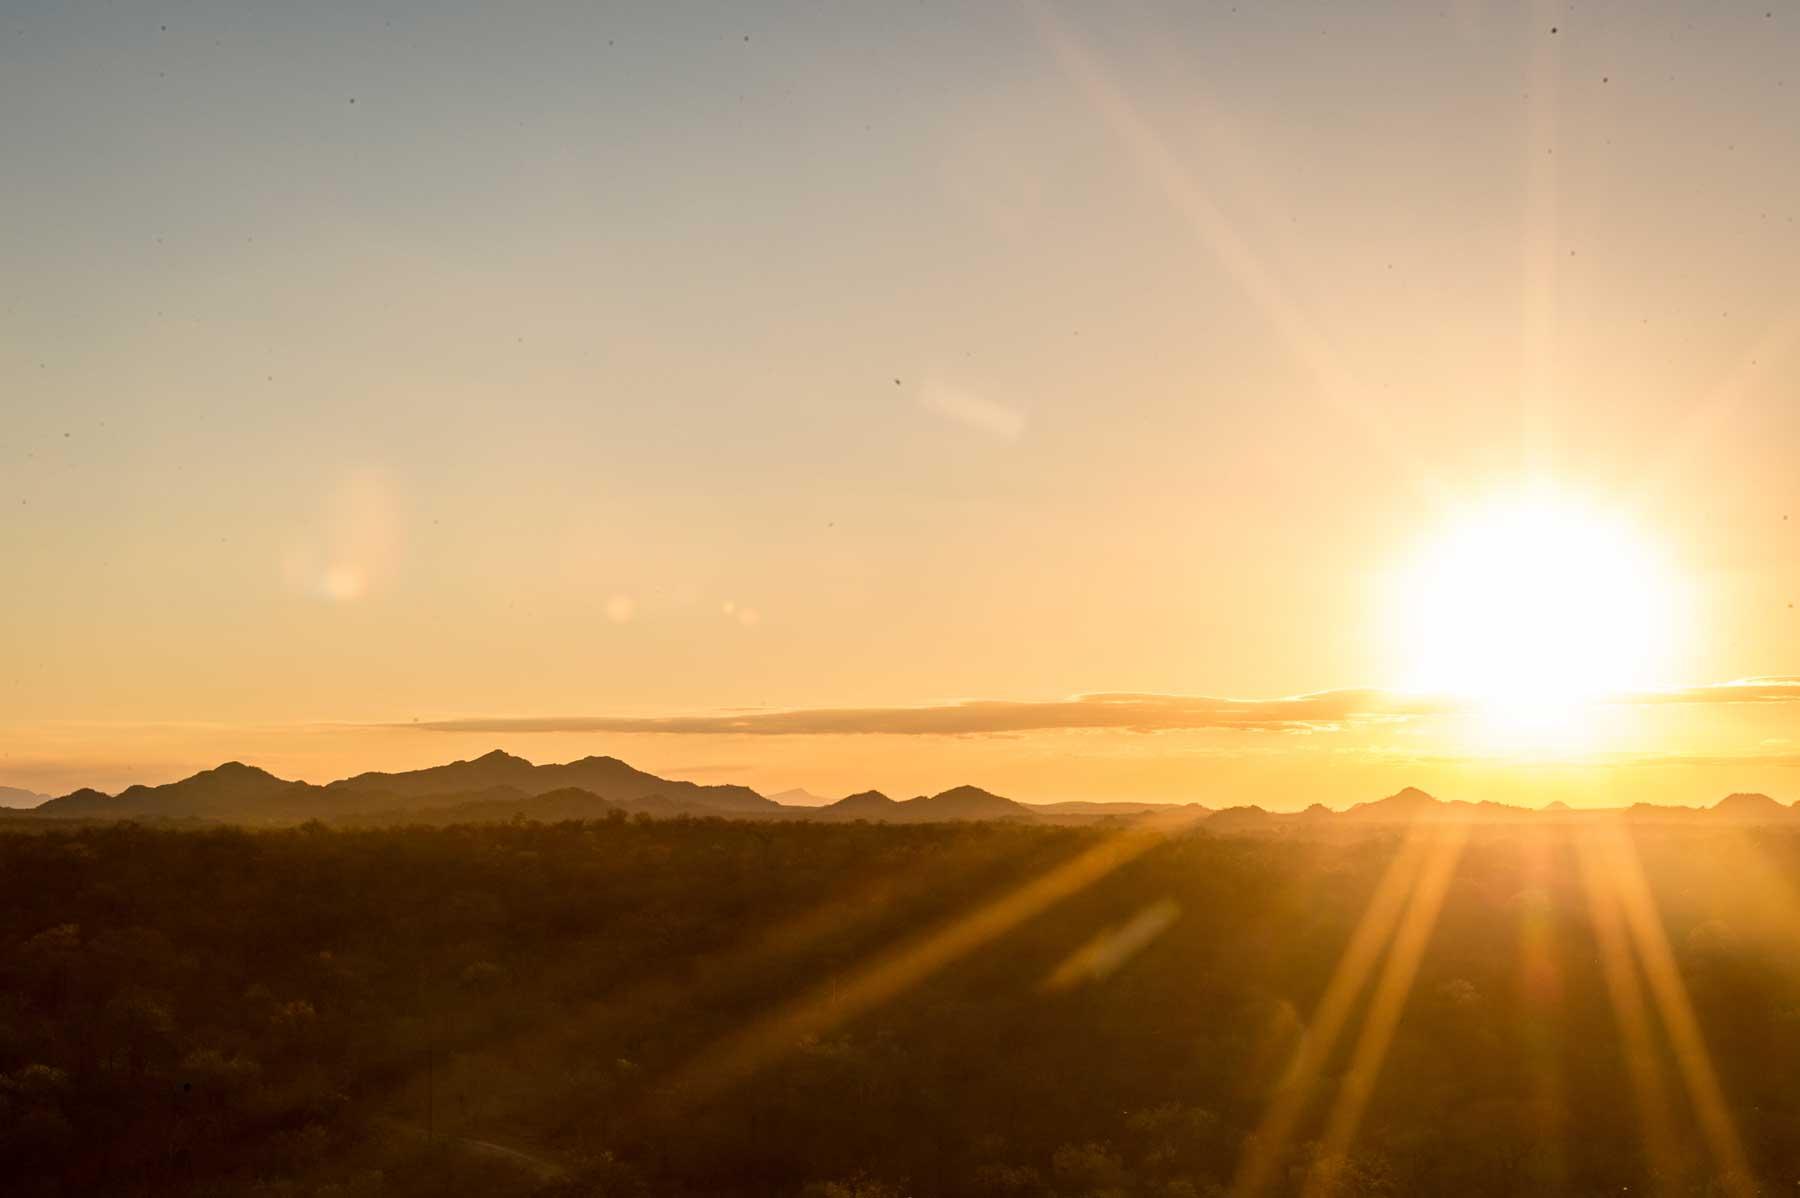 Our Honeymoon Sundowner Experience with a Classic Melvill & Moon Safari Set-up